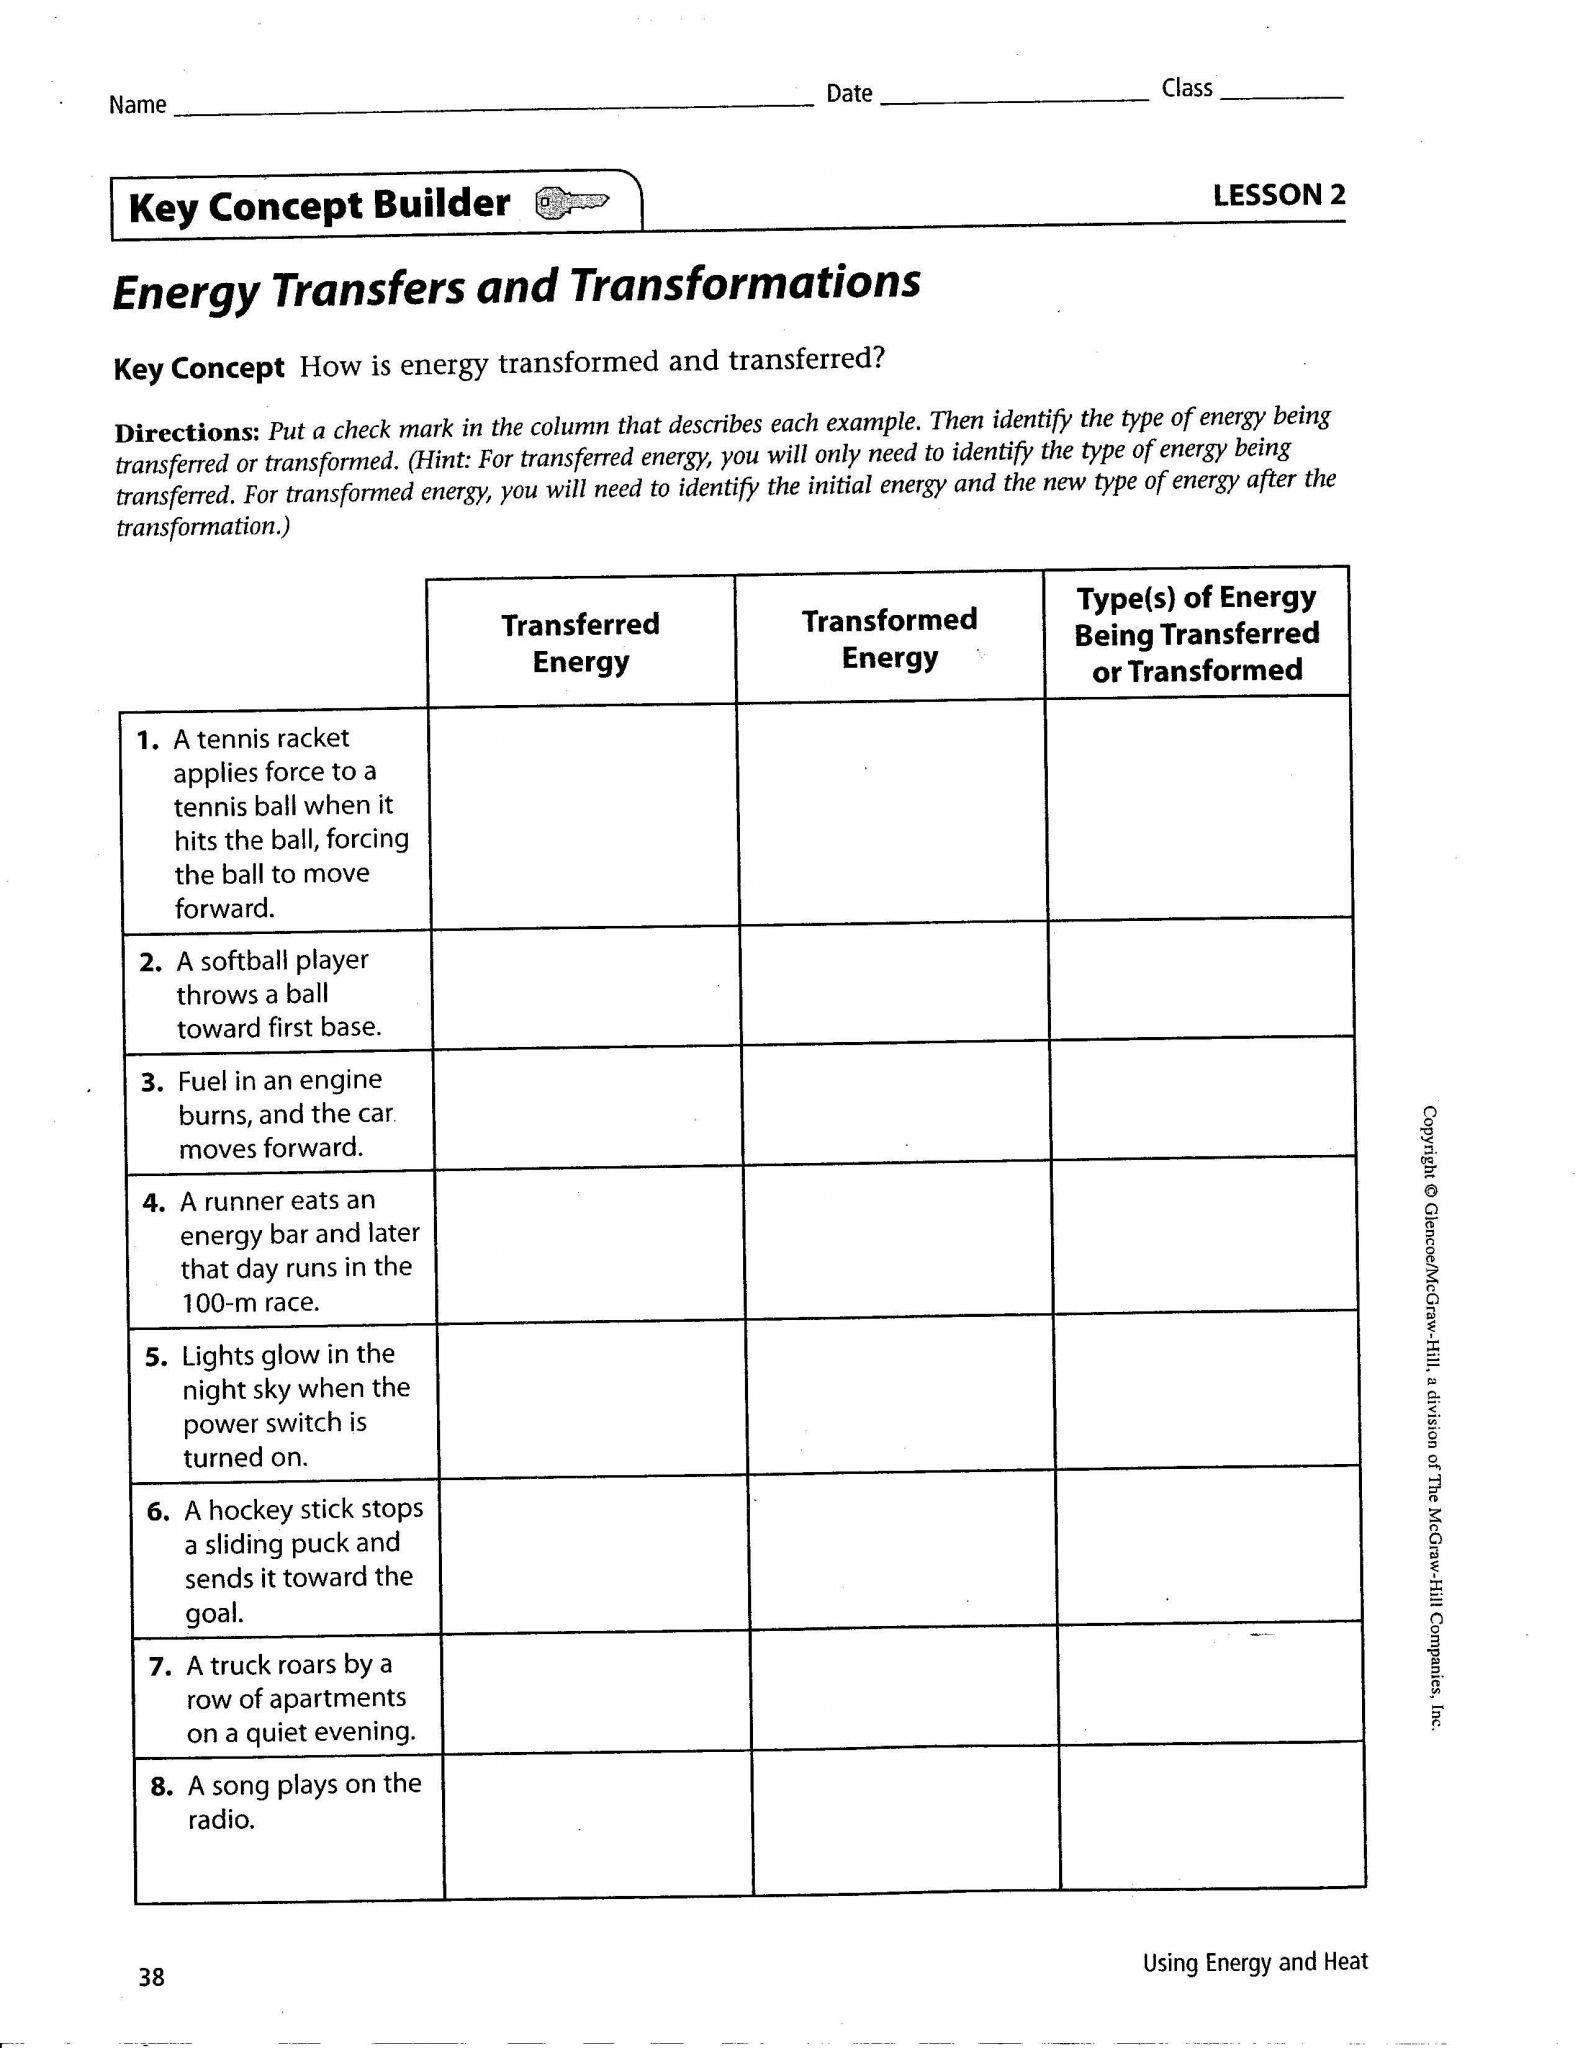 Energy Transformation Worksheet Answers Energy Transformation Worksheet Middle School In 2020